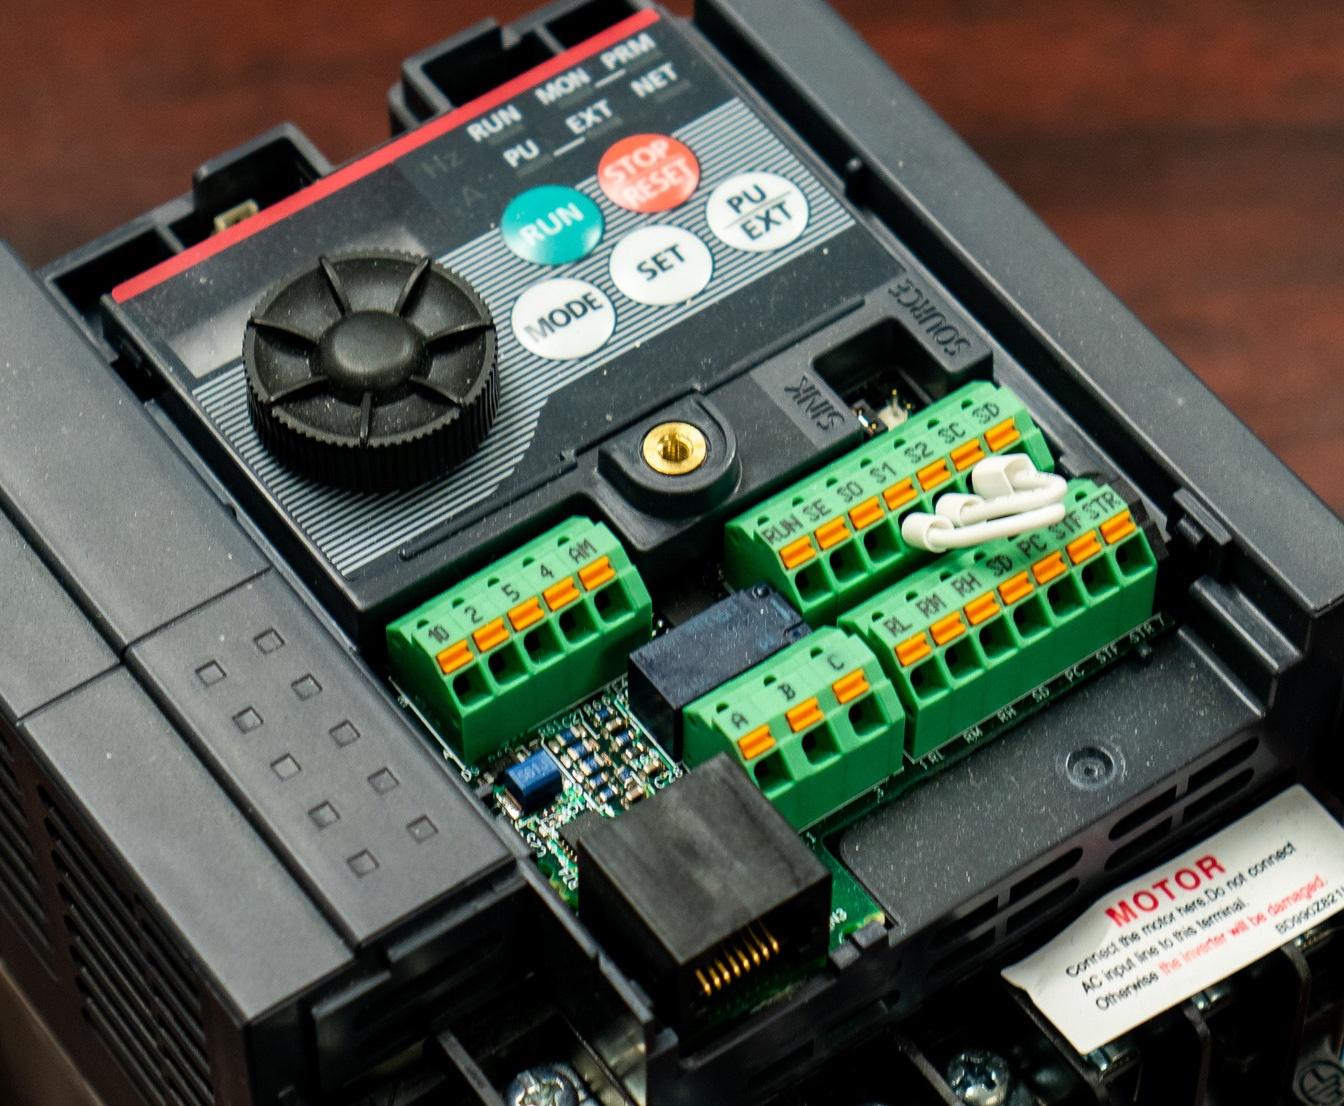 IoT: NexRev DrivePak Software